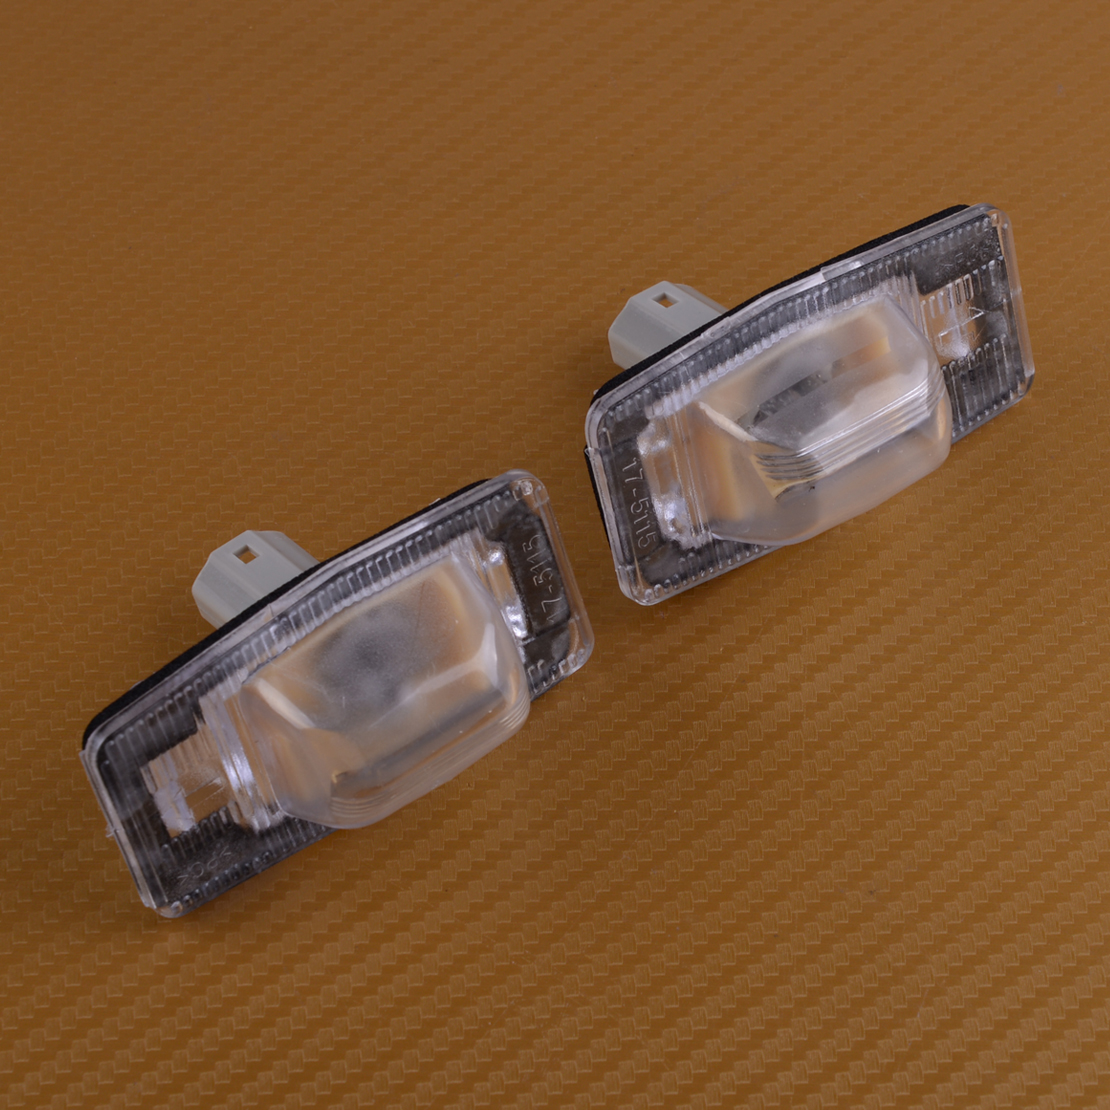 Beler 2 PCS Lizenz Platte Lampe Schwanz Licht NC1051270B Passt für Mazda MPV Protege Tribut Familia 323 Protege BJ 98 -03 Miata